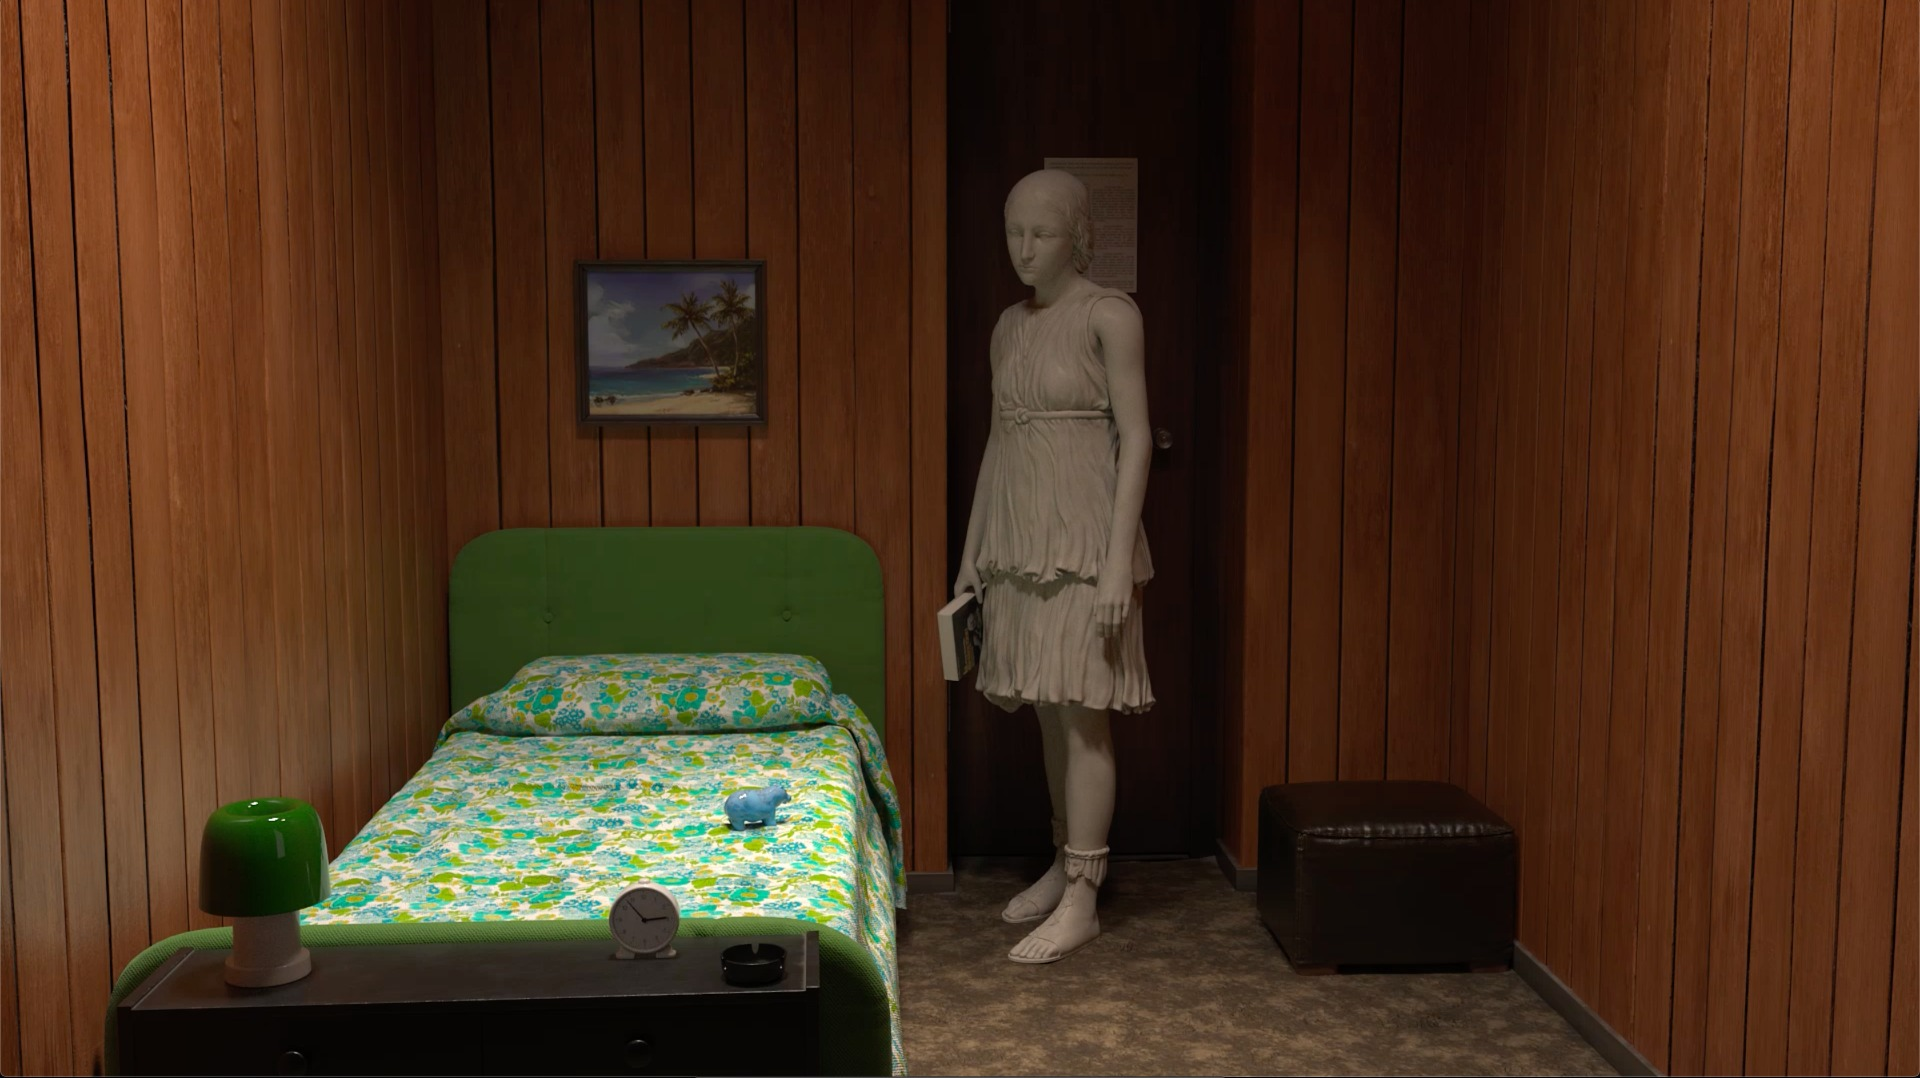 GabrielAbrantes_Two-Sculptures-Quarreling-in-a-Hotel-Room_FranciscoFino_8500 present future